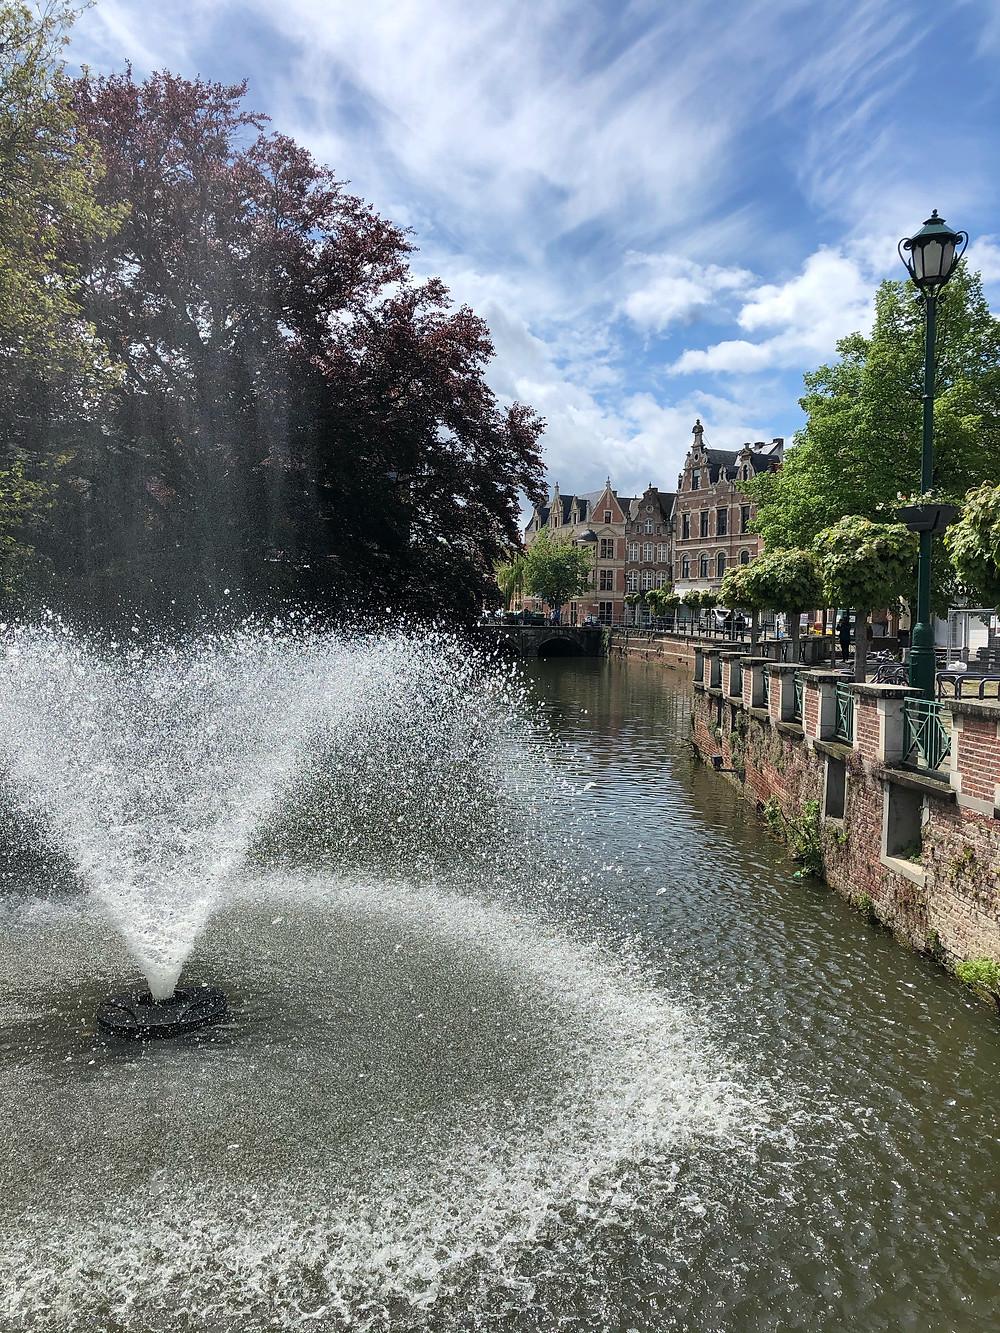 River De Nete Vismarkt Lier